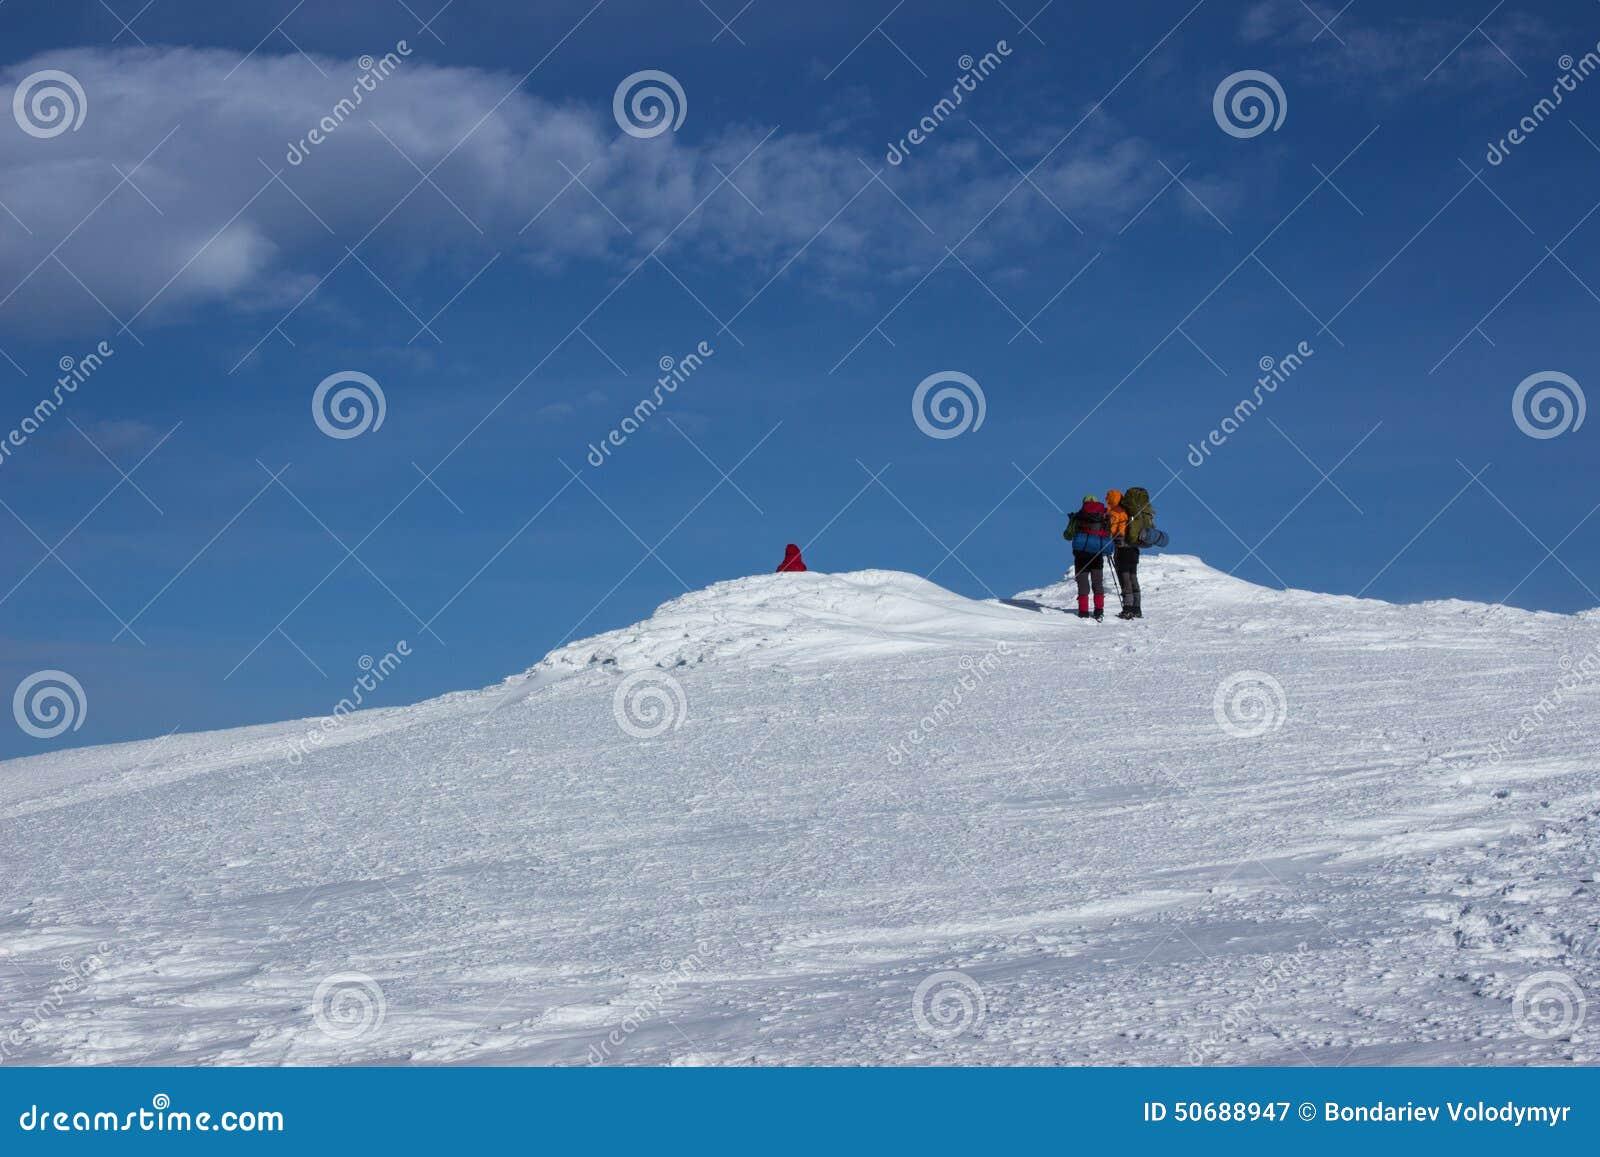 Download 在雪靴的冬天高涨 库存图片. 图片 包括有 室外, 活动家, 高度, 高涨, 有效地, 多雪, 能源, 健康 - 50688947